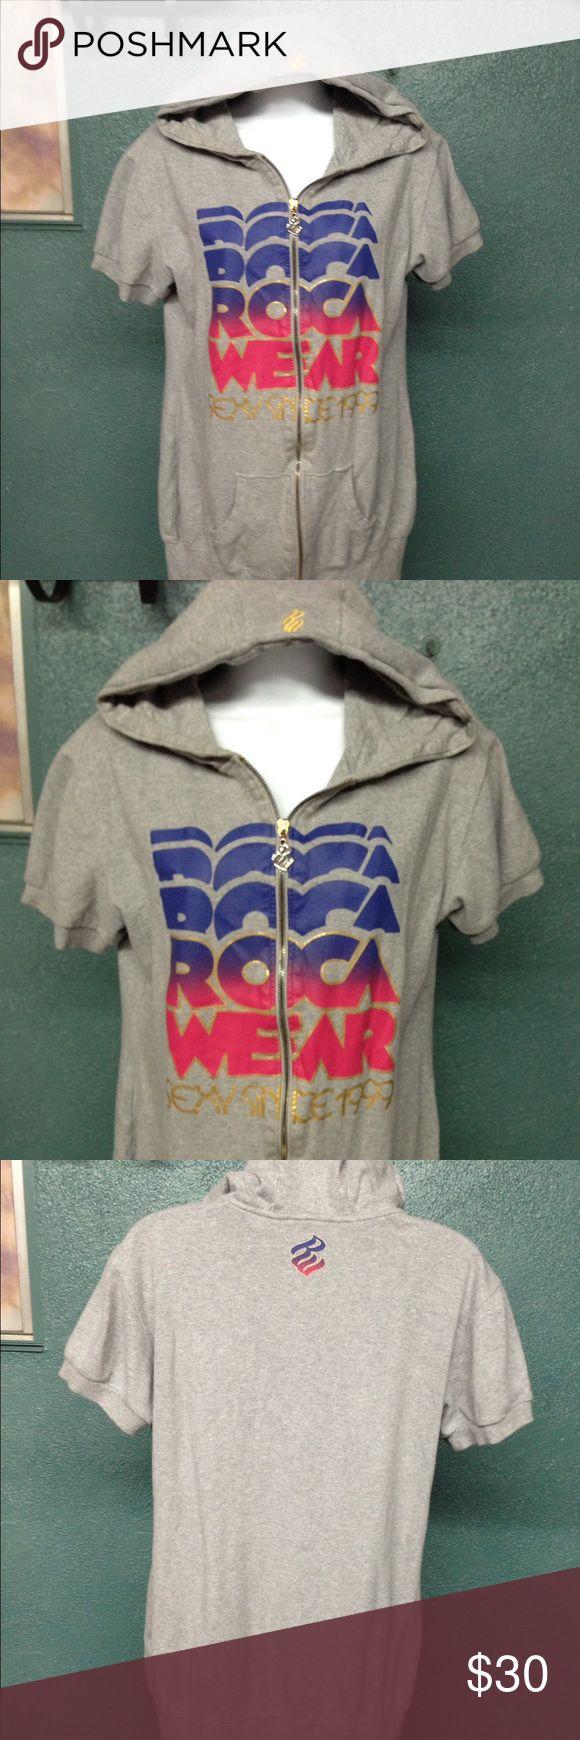 Rocawear Short Sleeve Hoodie! XL Rocawear short sleeve hooded sweatshirt. Sweatshirt is in great condition and is true to size. Sweatshirt is light gray. Rocawear Tops Sweatshirts & Hoodies